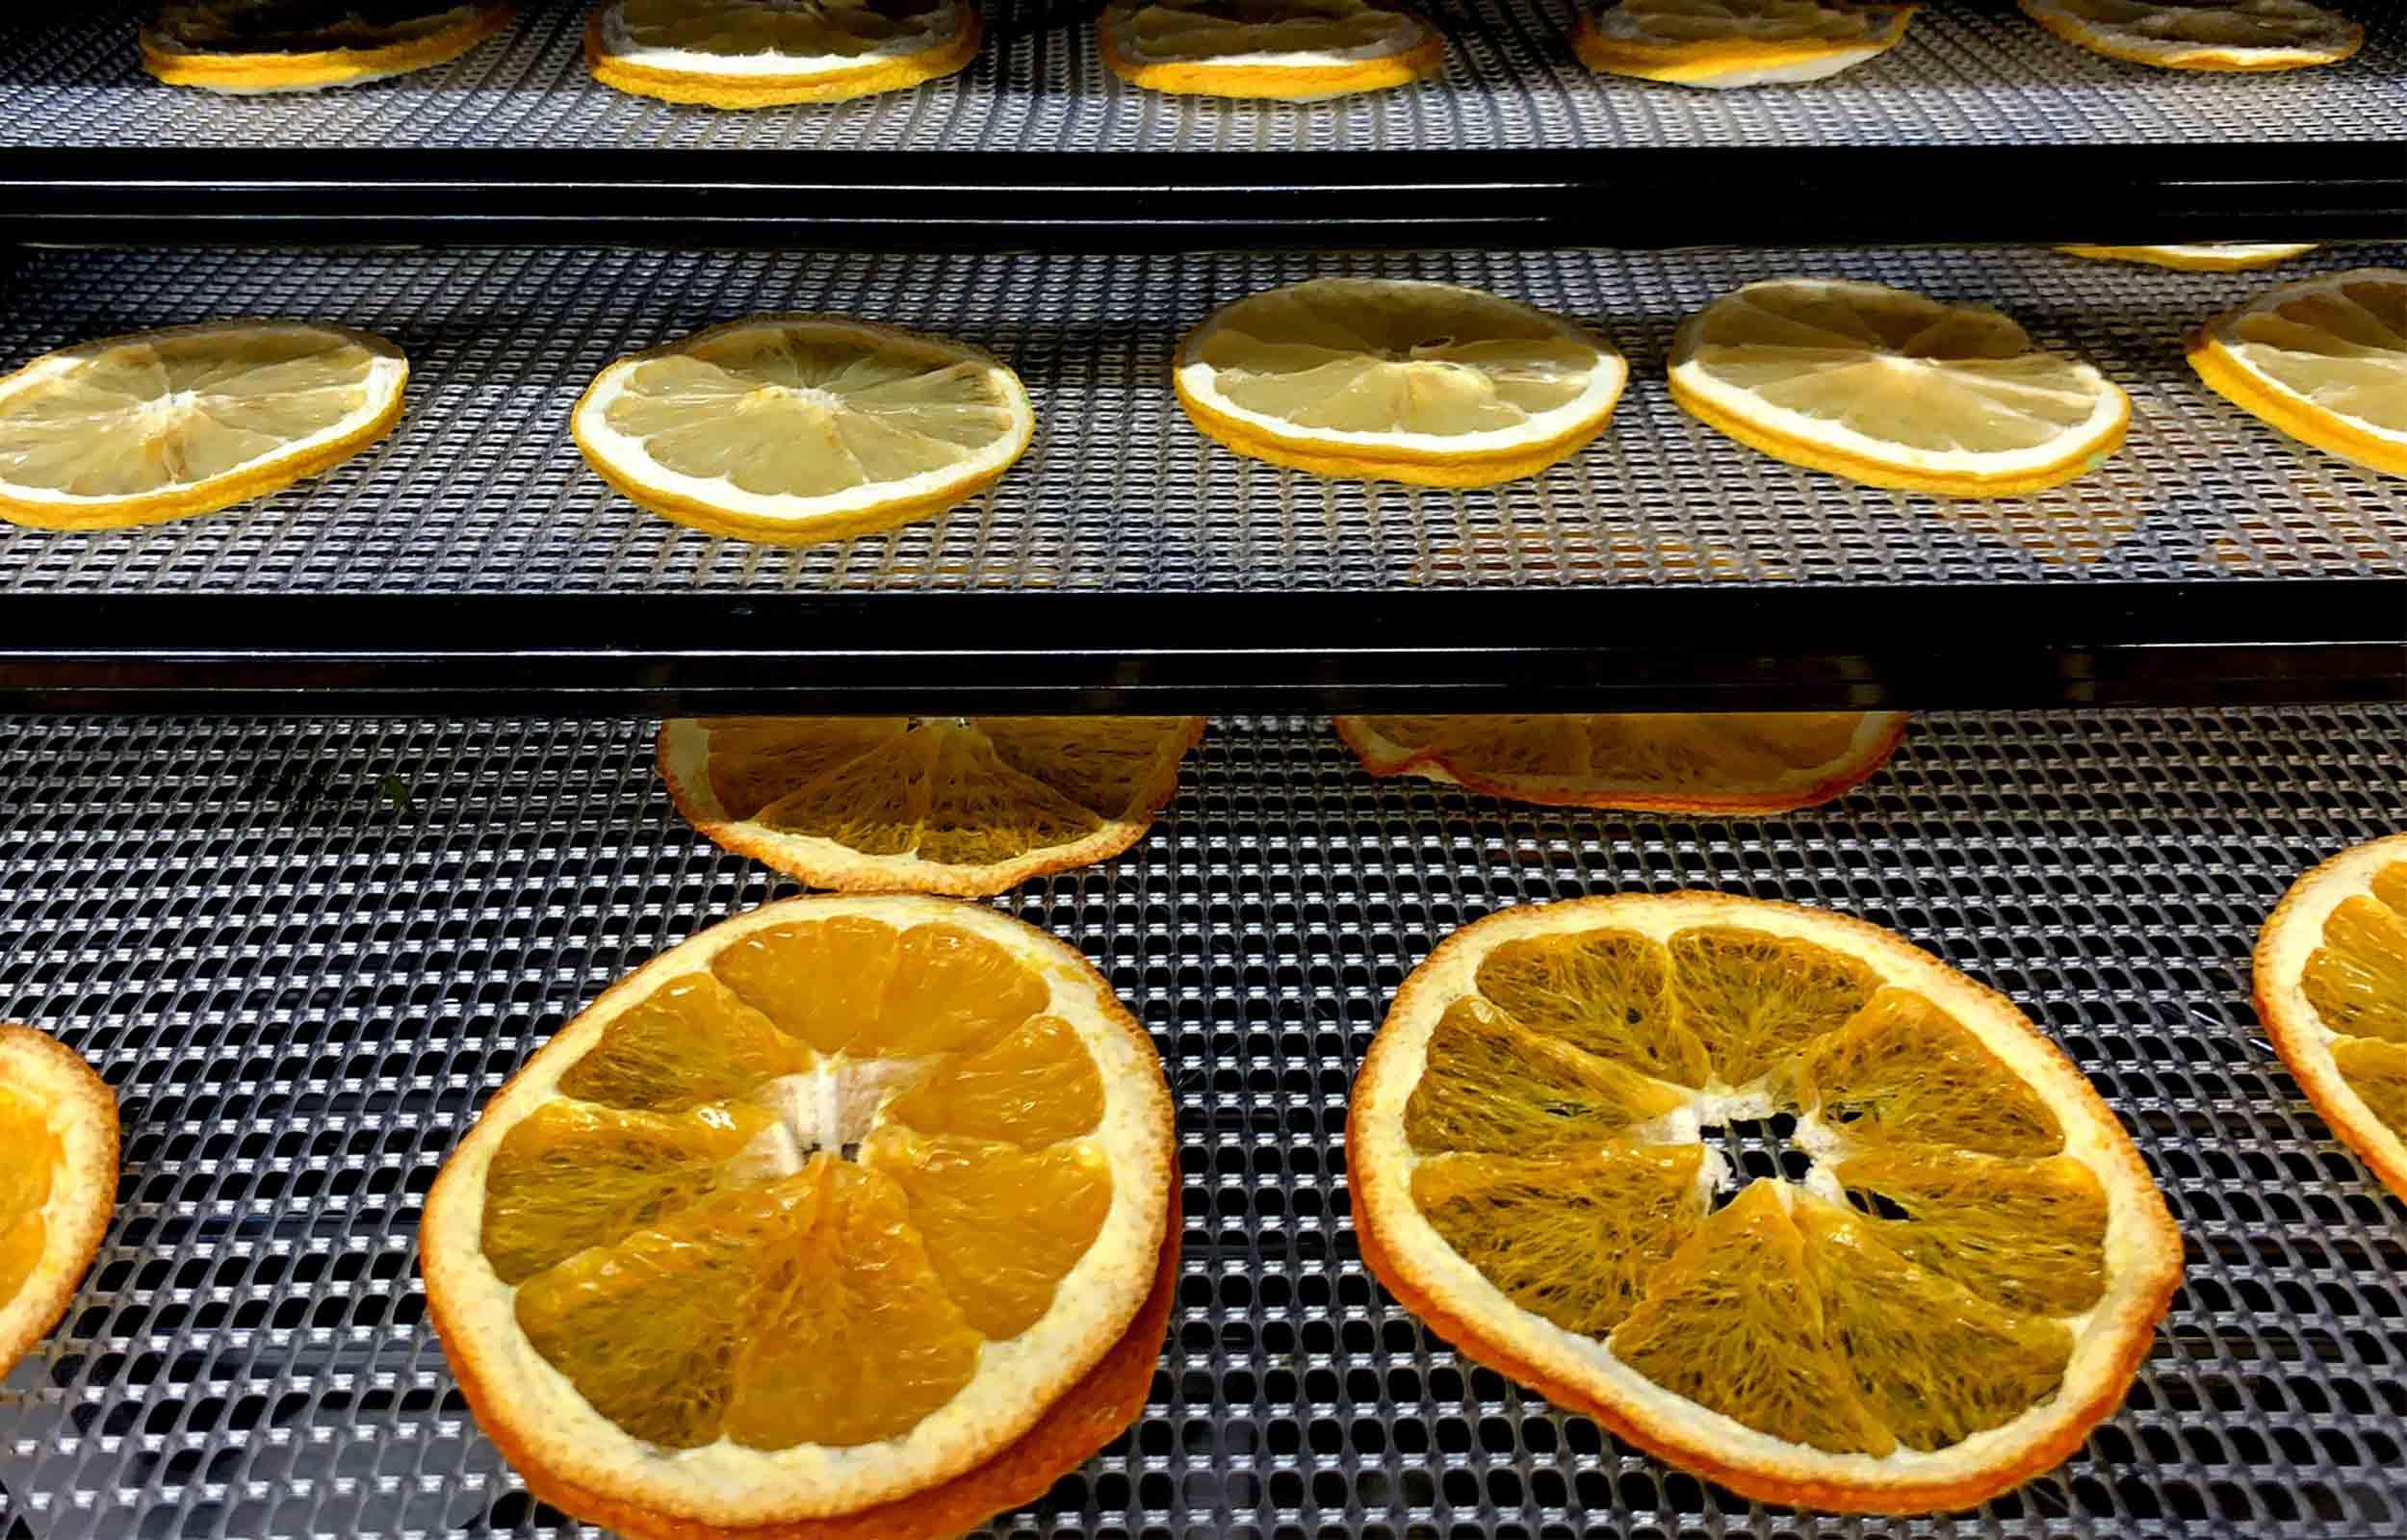 orange slices dehydrating